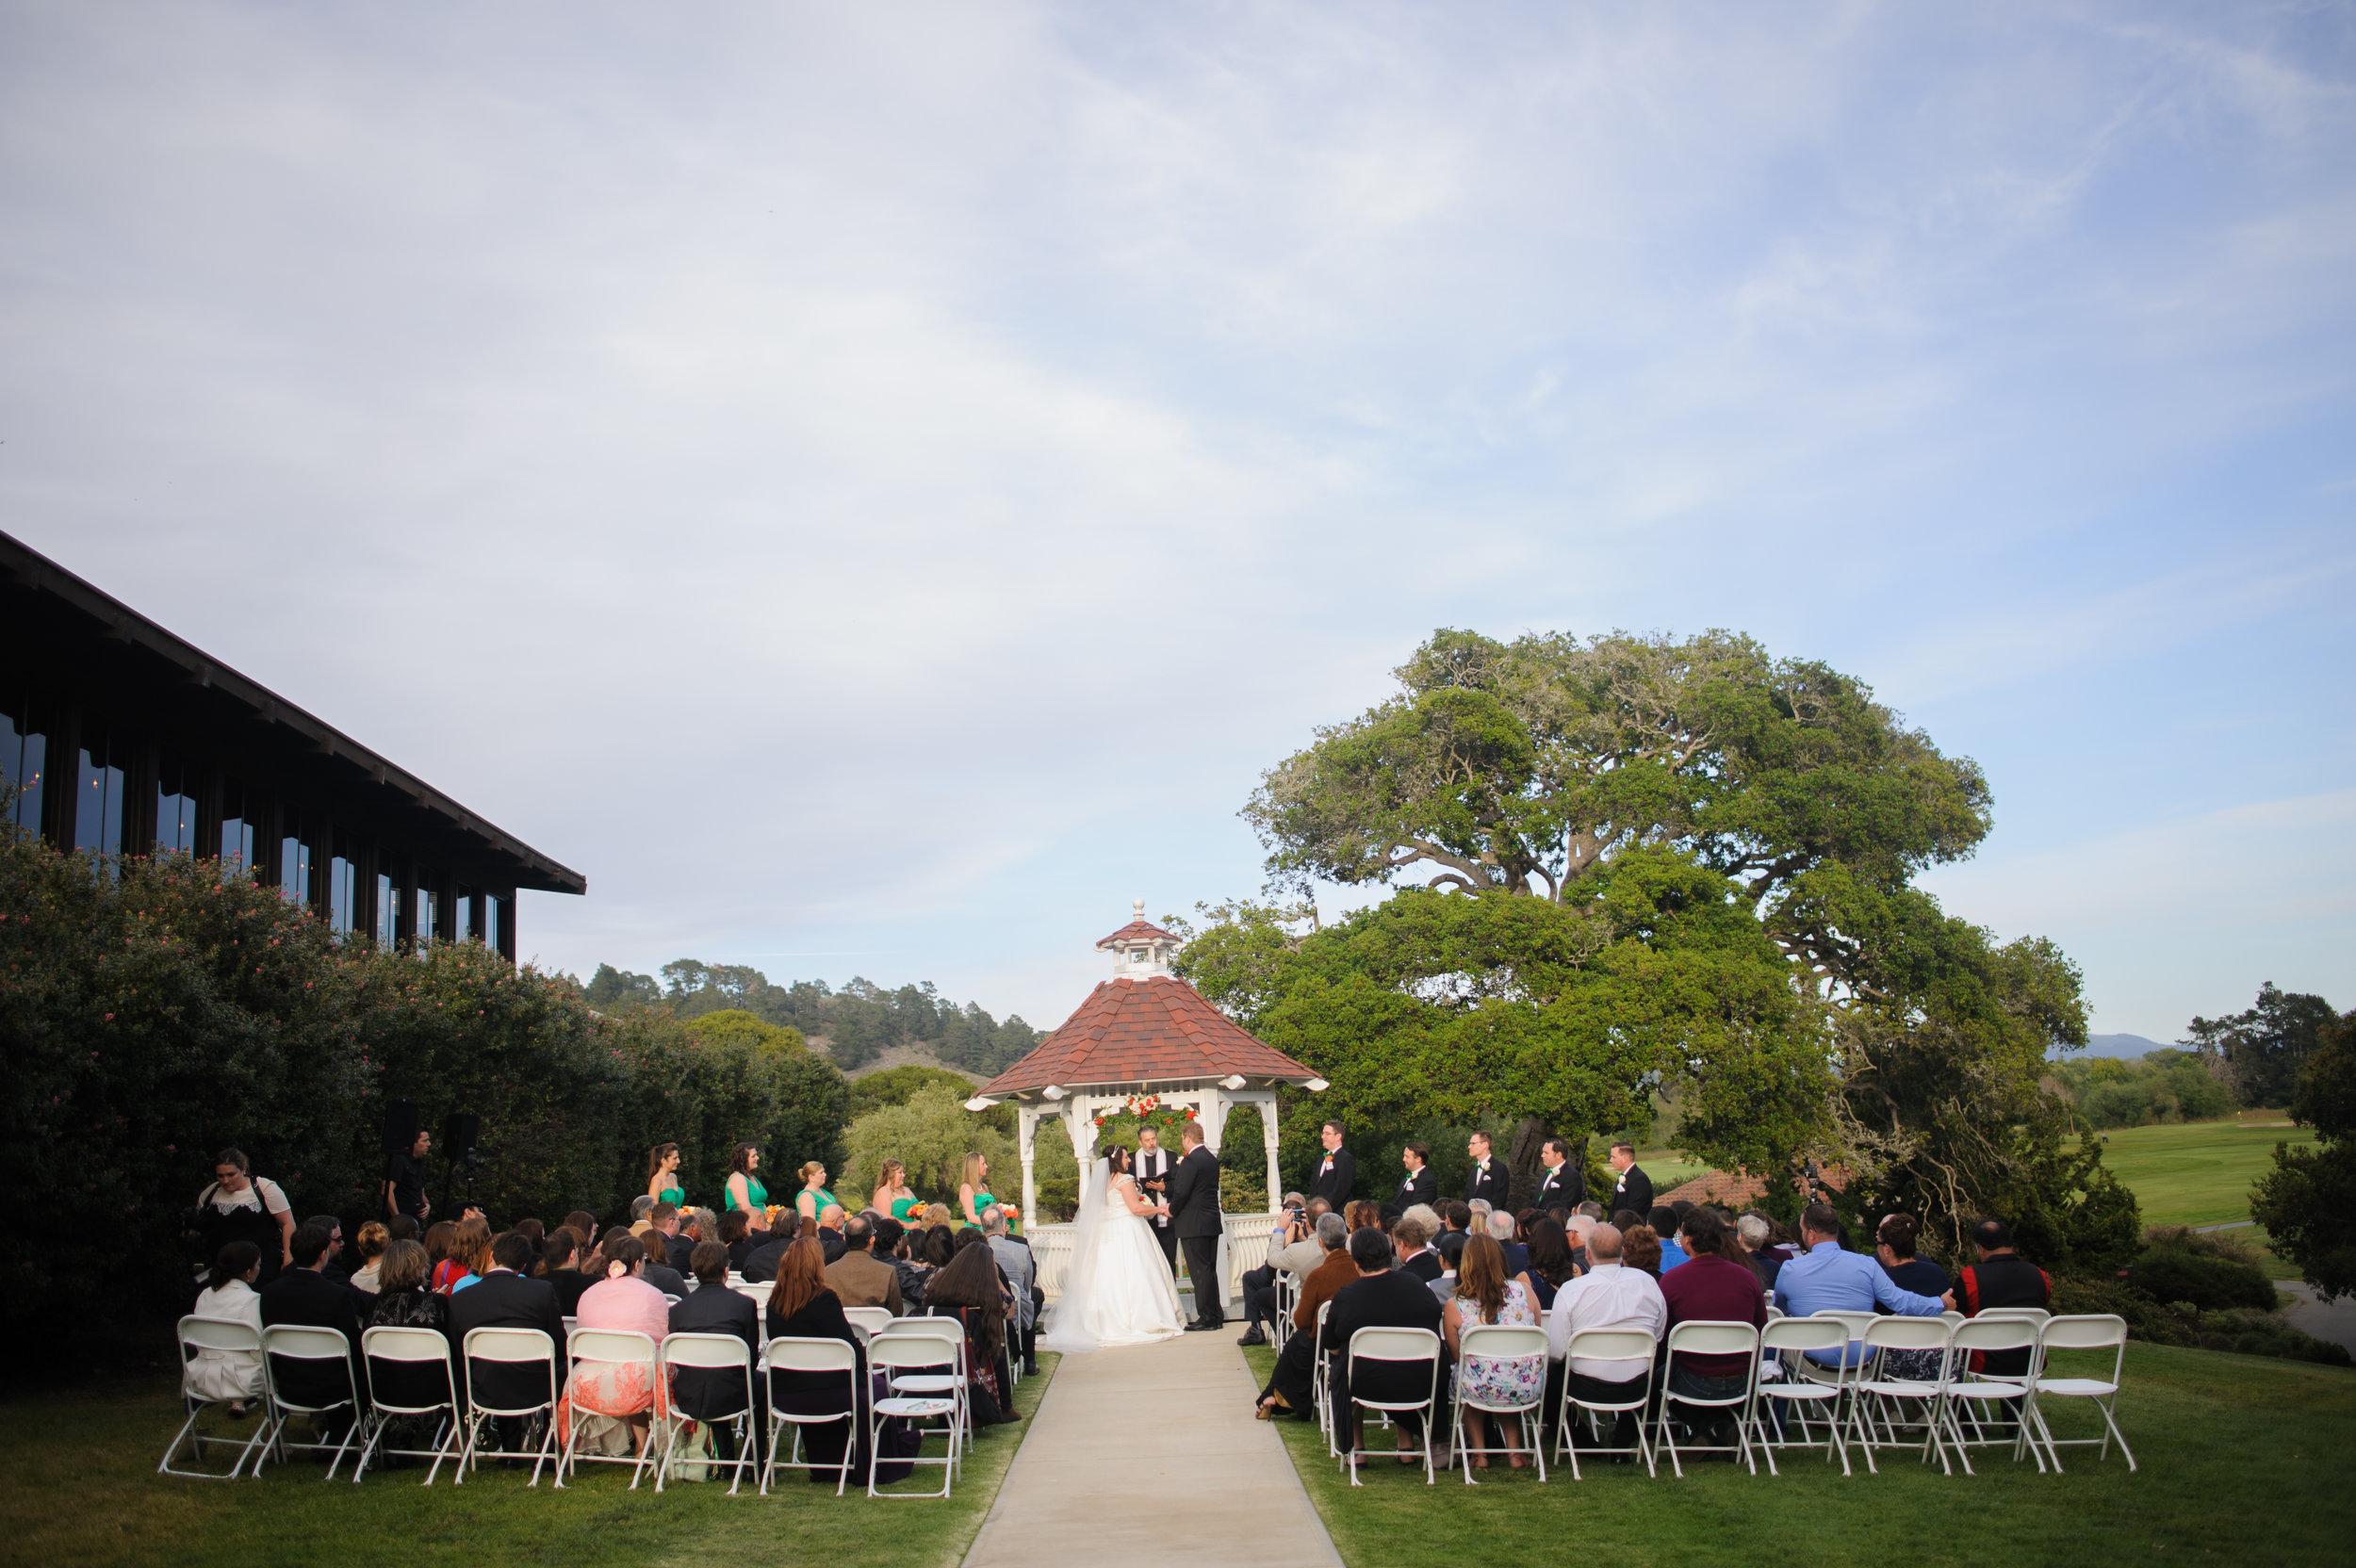 lauren-joel-001-rancho-canada-golf-course-carmel-wedding-photographer-katherine-nicole-photography013.JPG